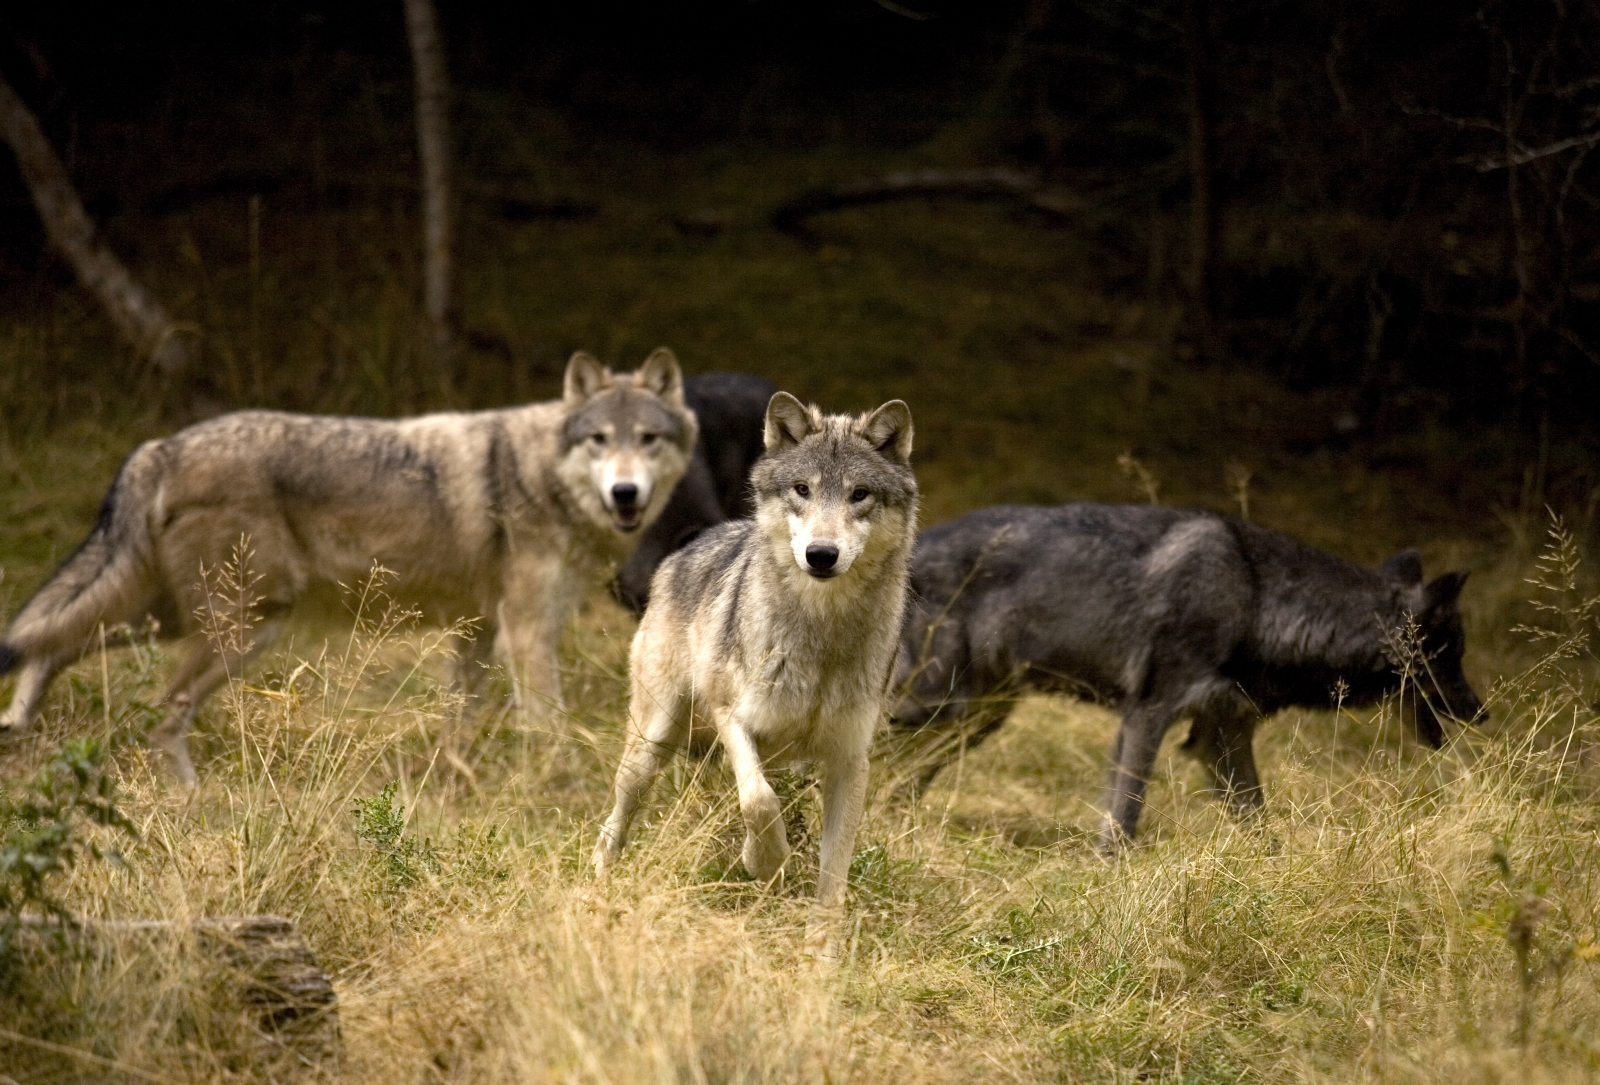 Wolves in Alaska's Denali National Park